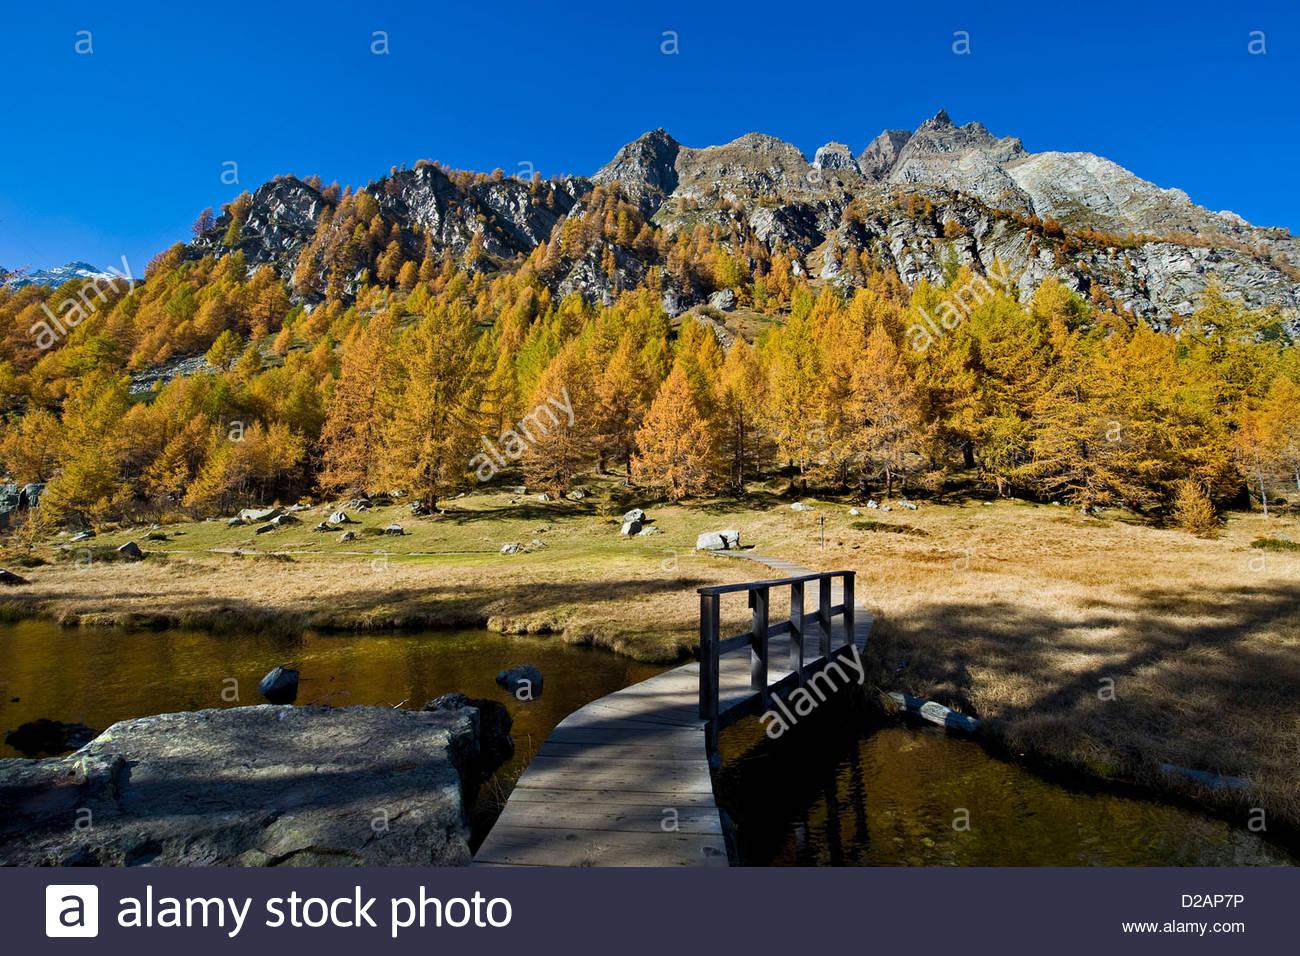 Italy,Piedmont,Devero alp,Alpe Devero - Stock Image